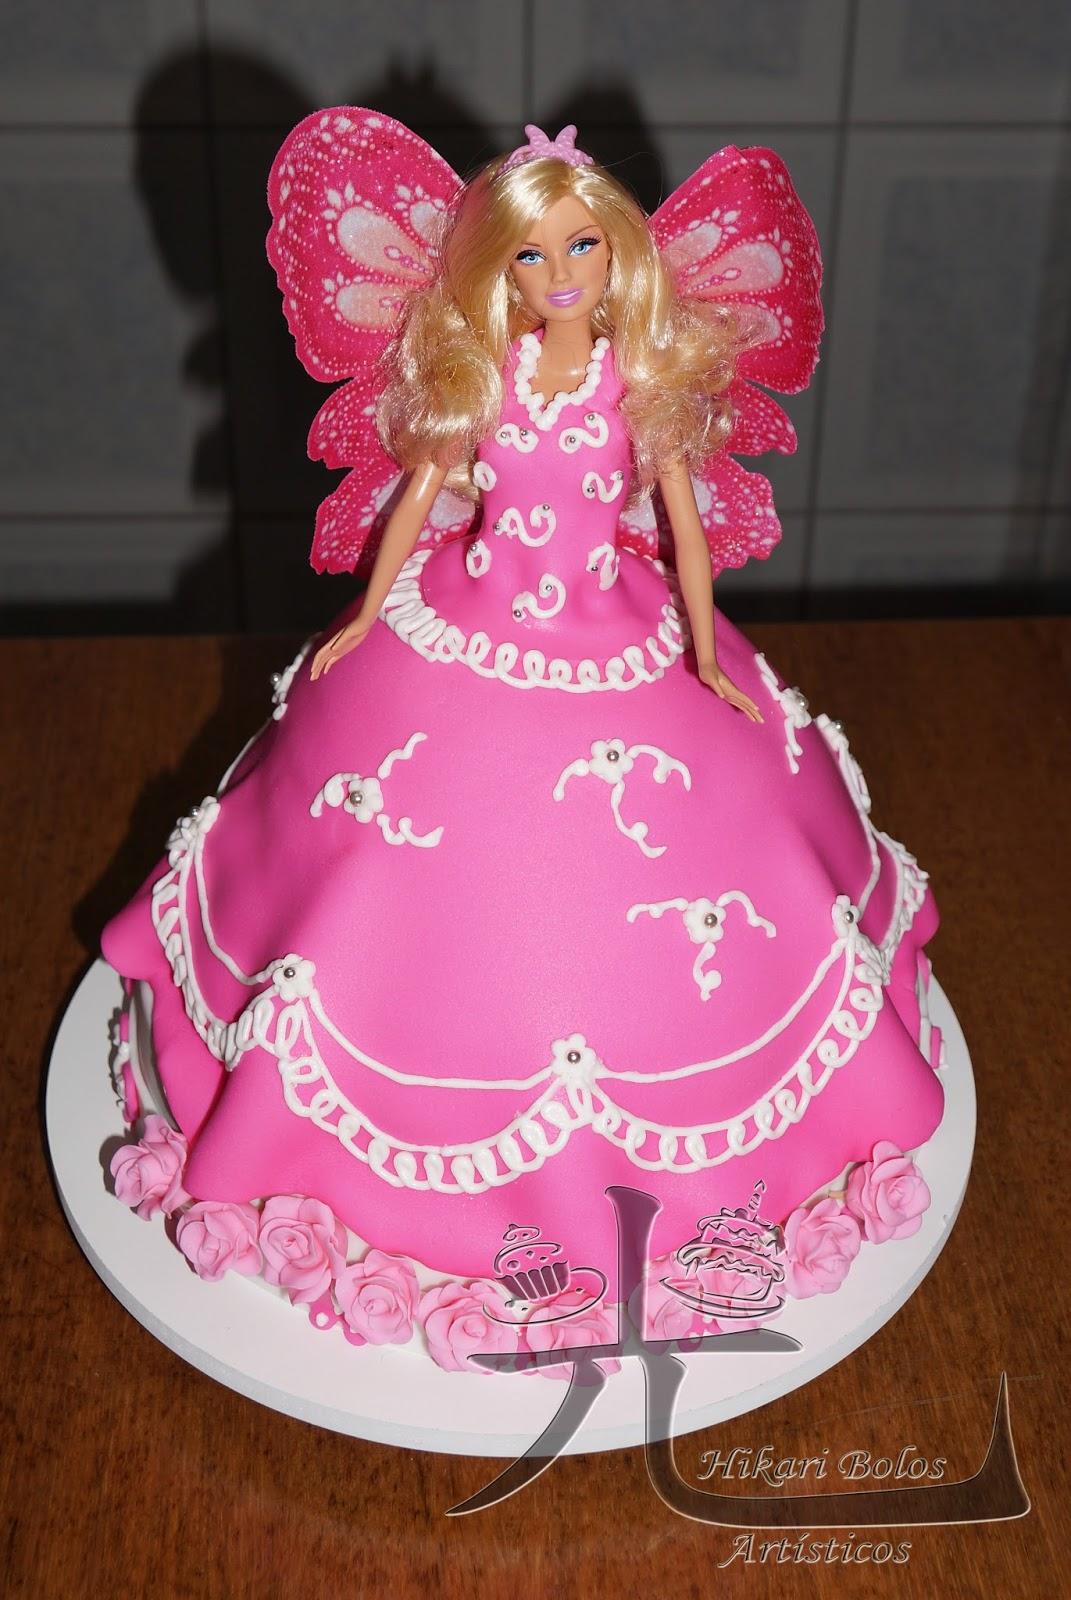 Hikari bolos artsticos bolo barbie borboleta bolo barbie borboleta altavistaventures Image collections